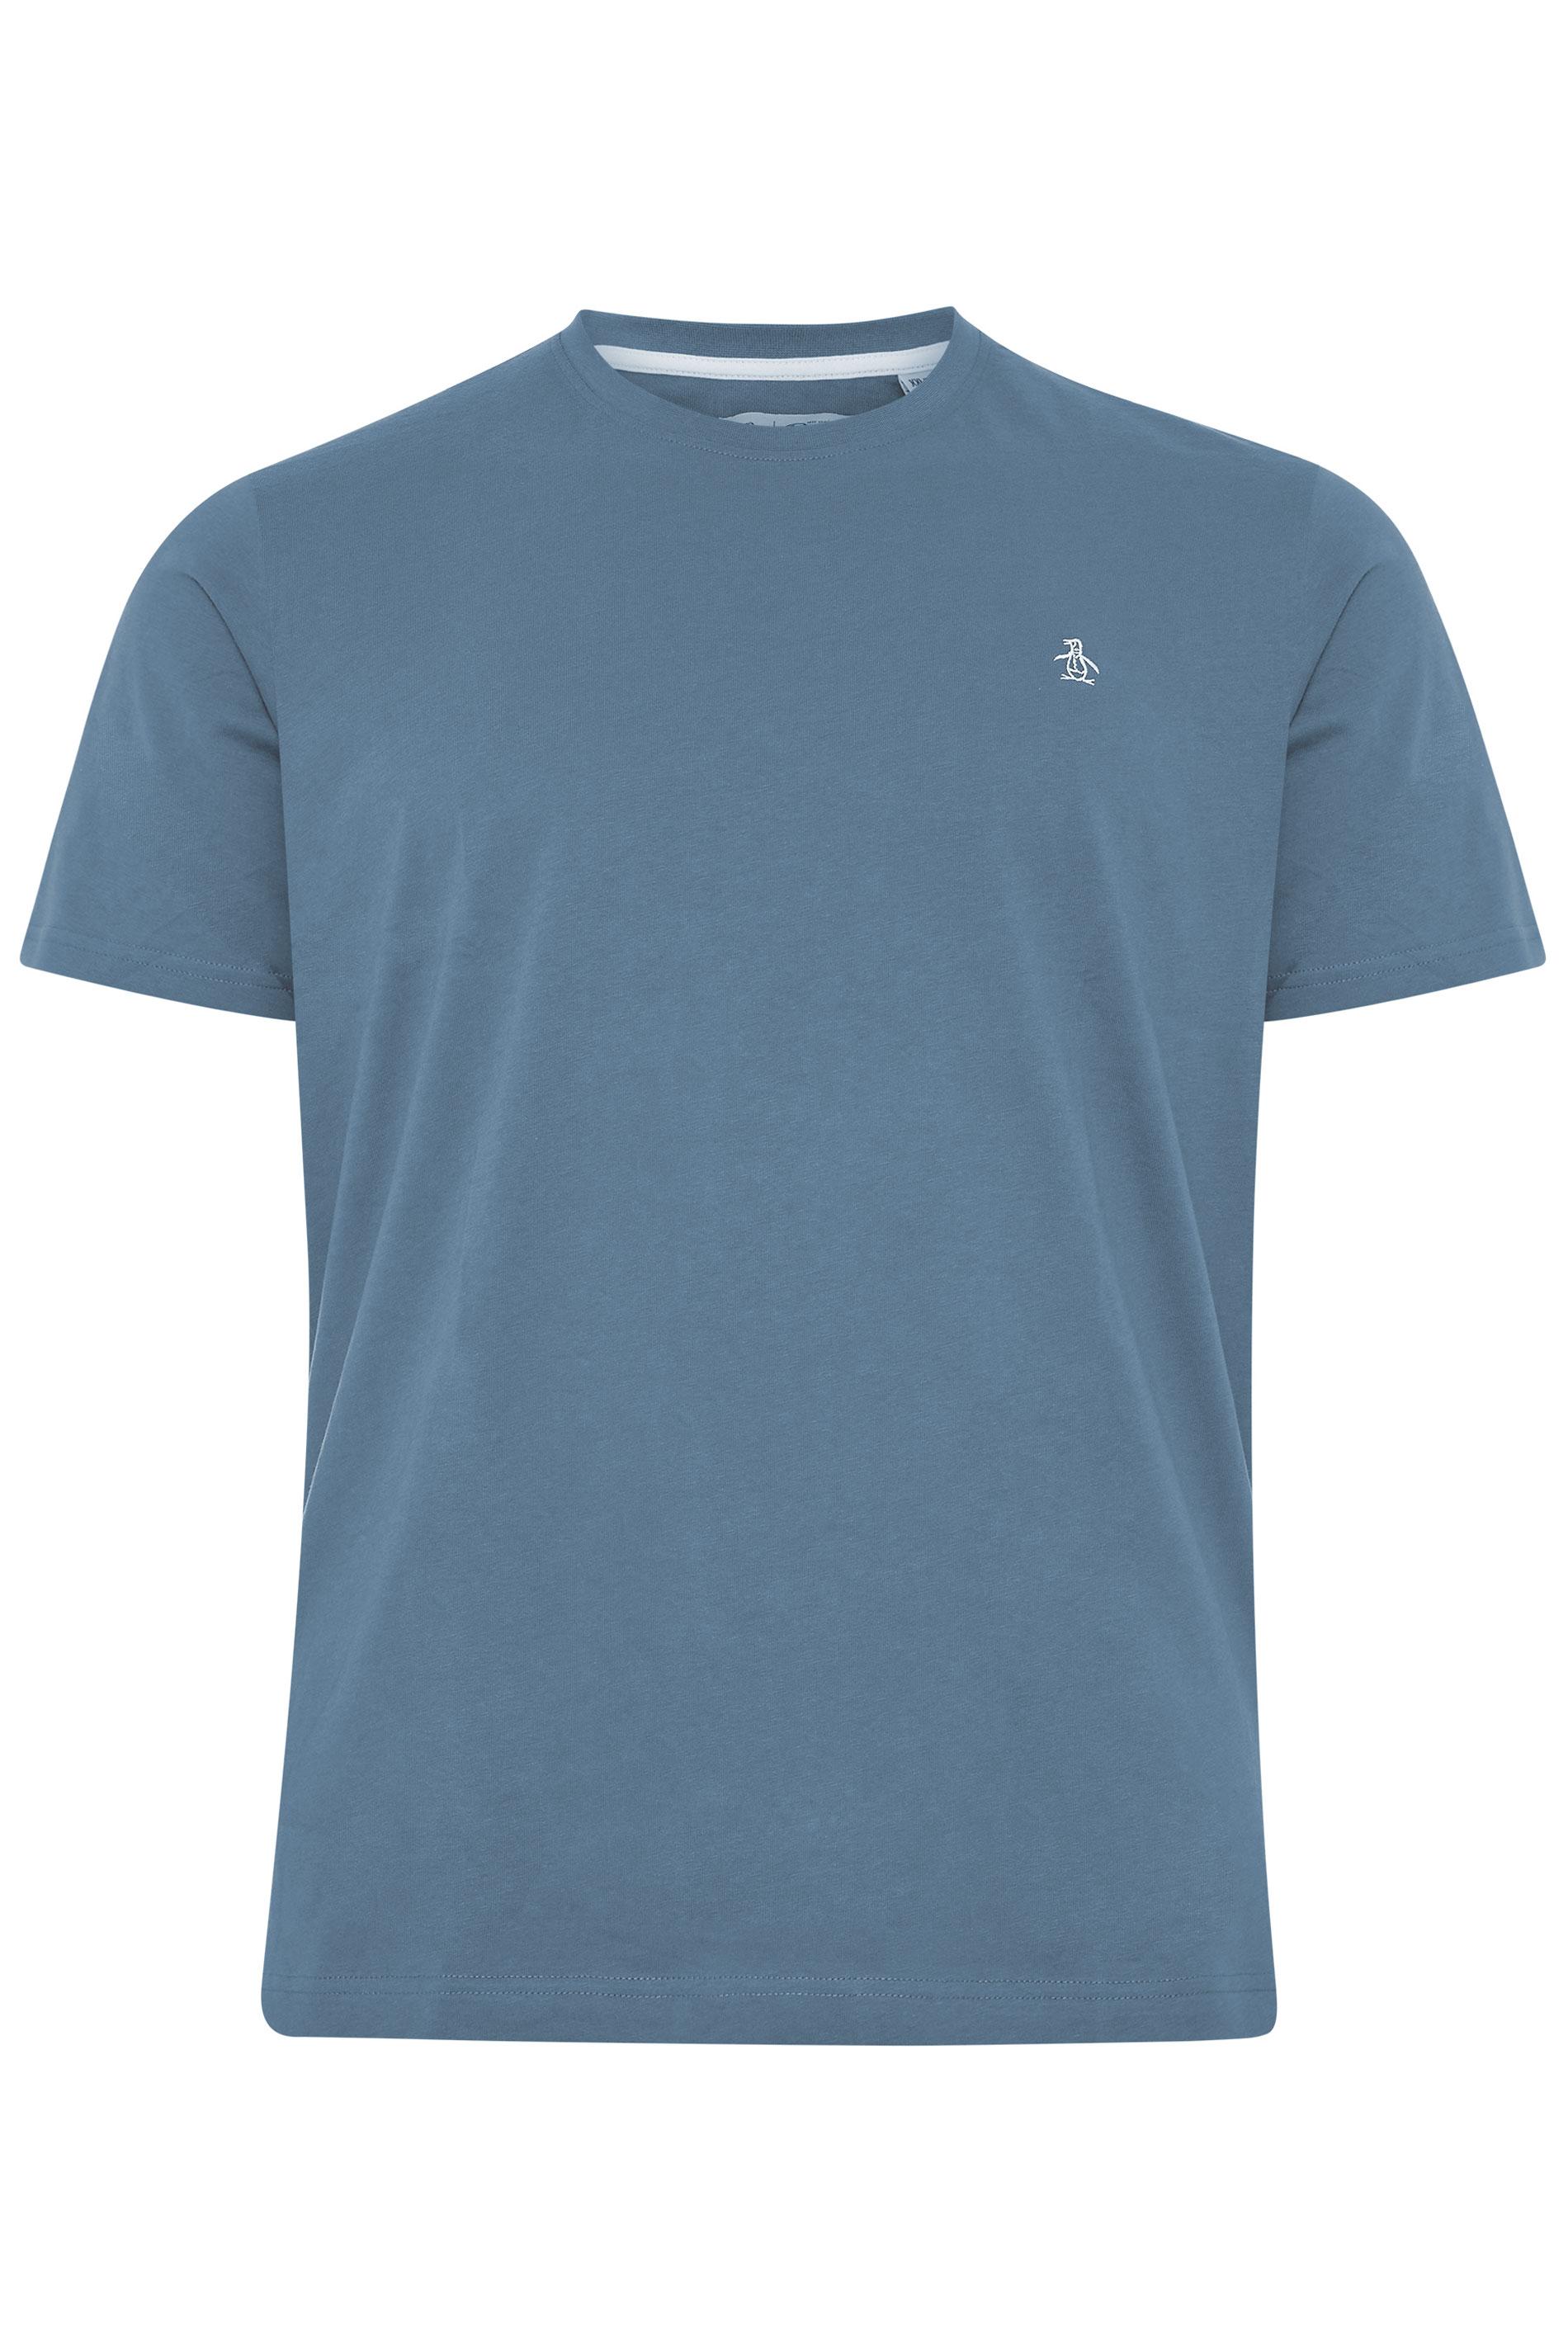 PENGUIN MUNSINGWEAR Blue Crew Neck T-Shirt